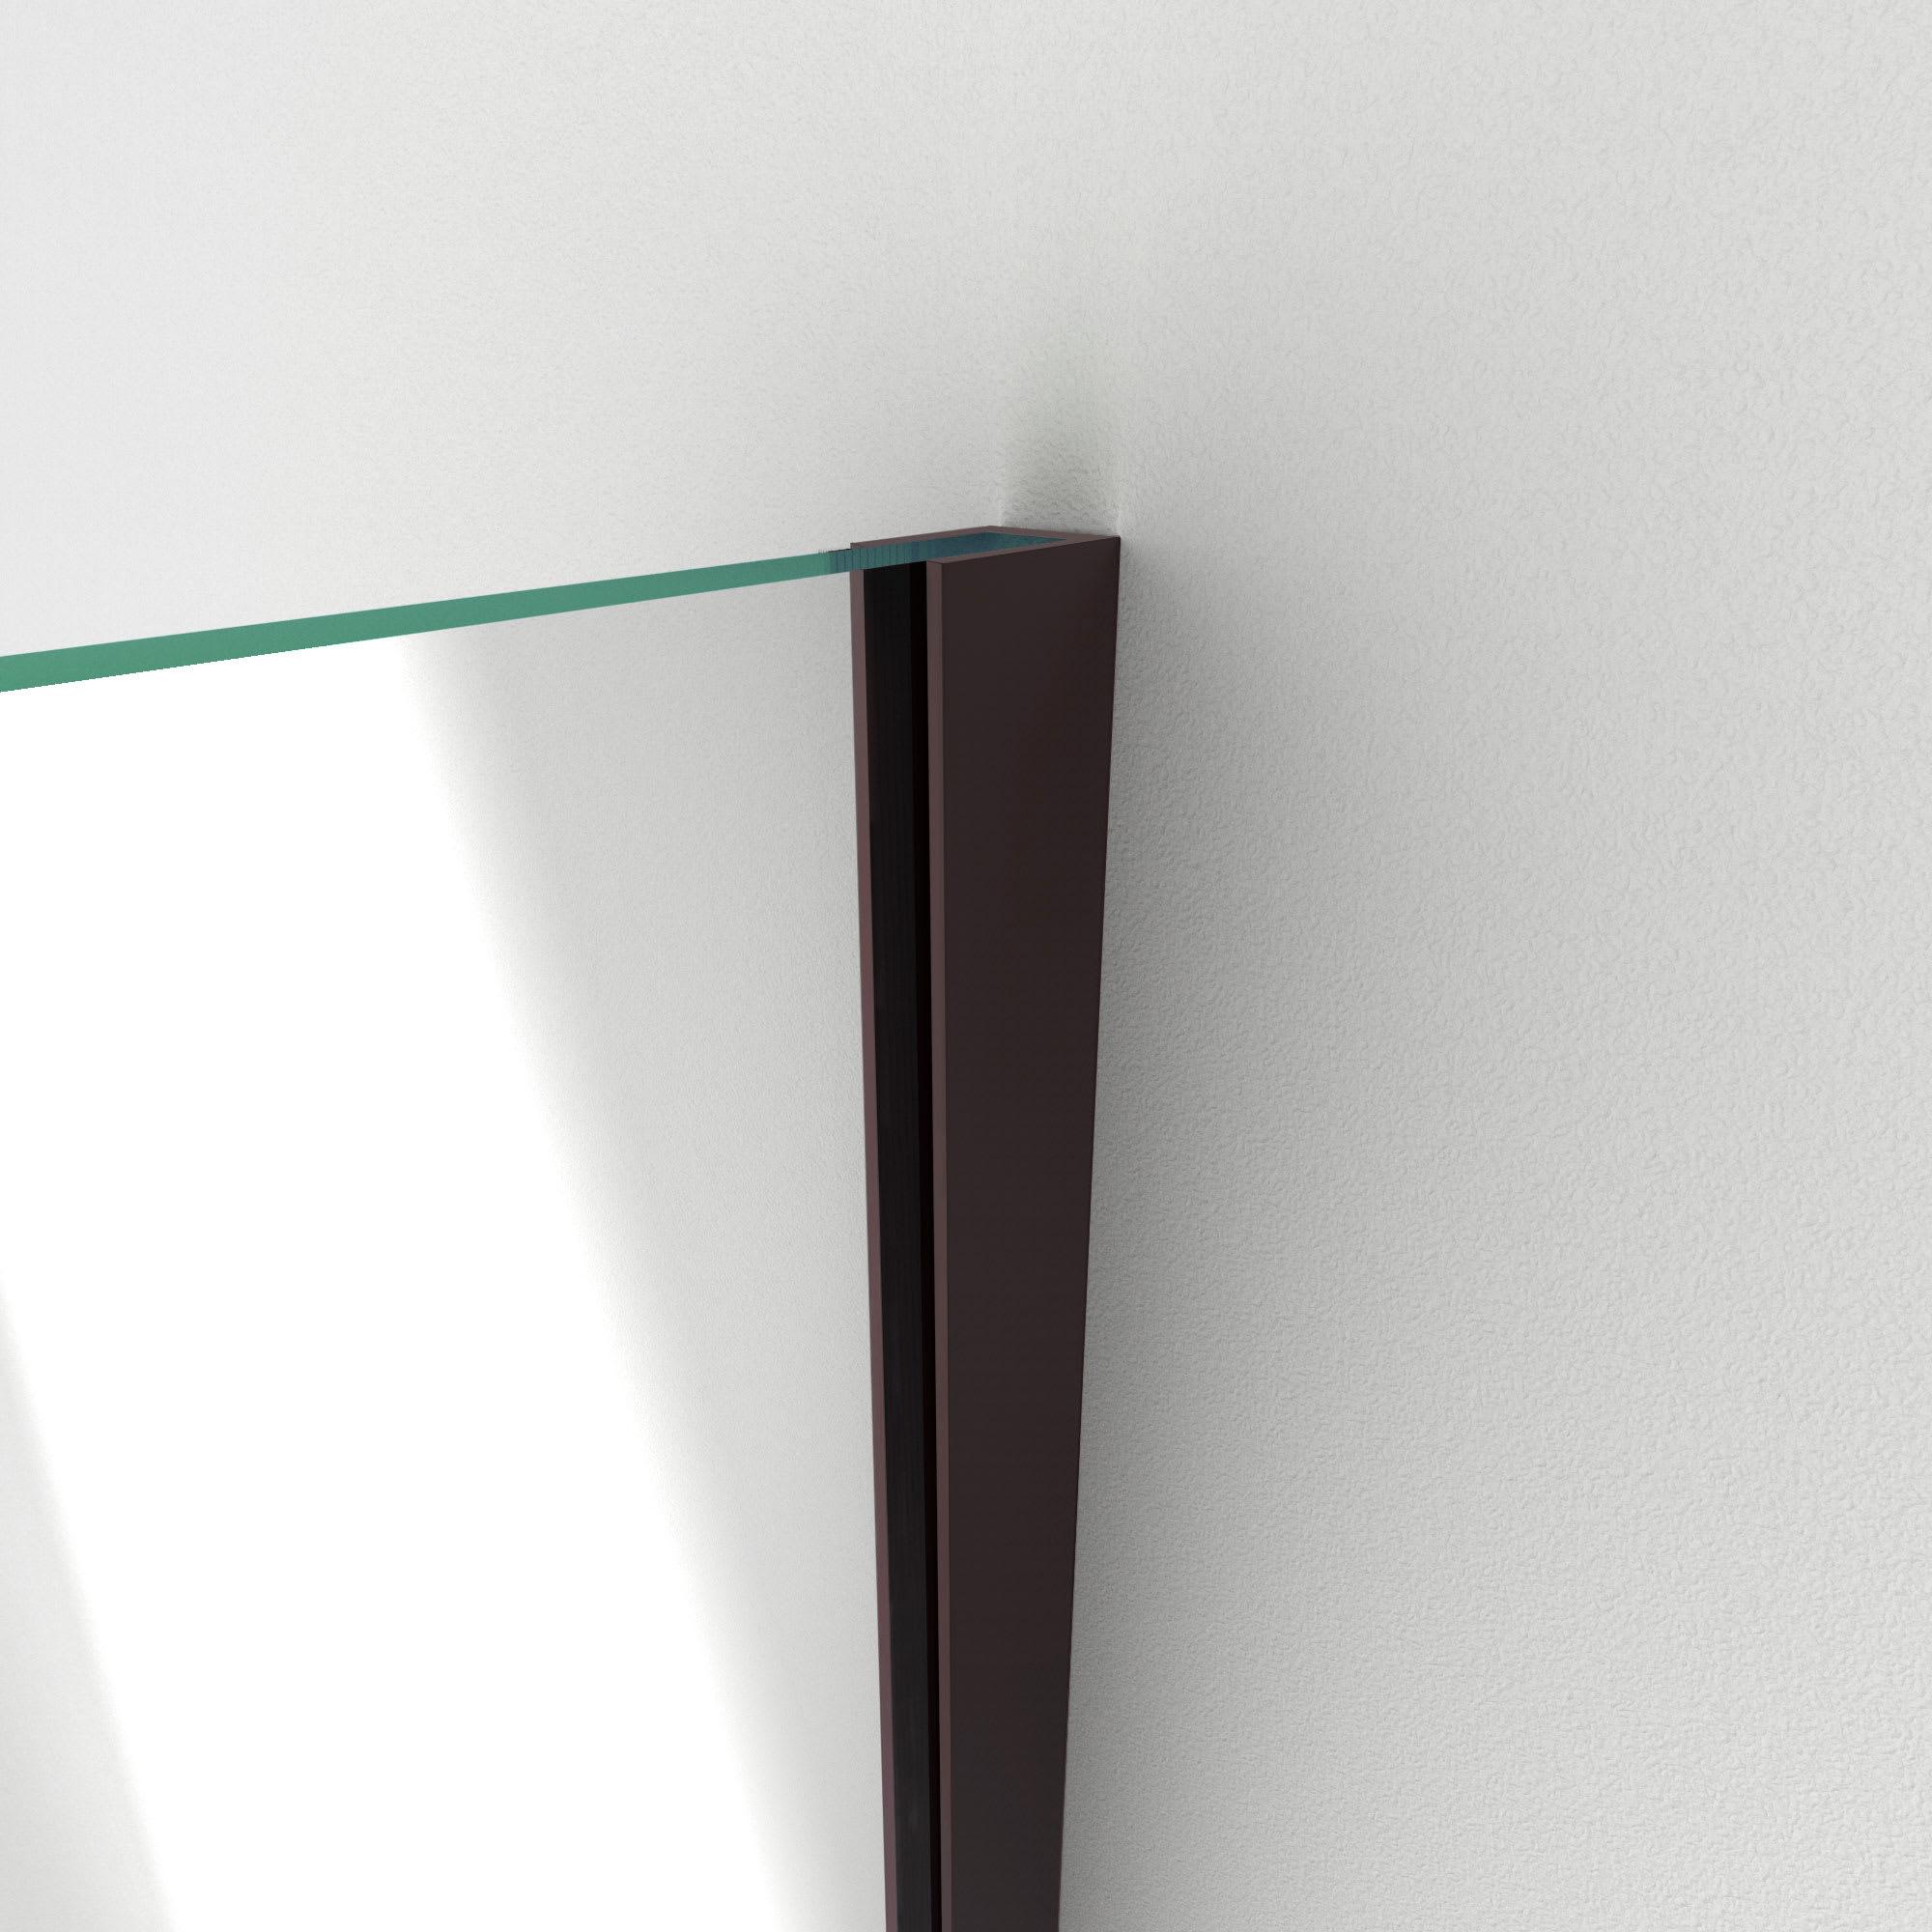 W X 72 In H Frameless Hinged Shower Door In Satin Black